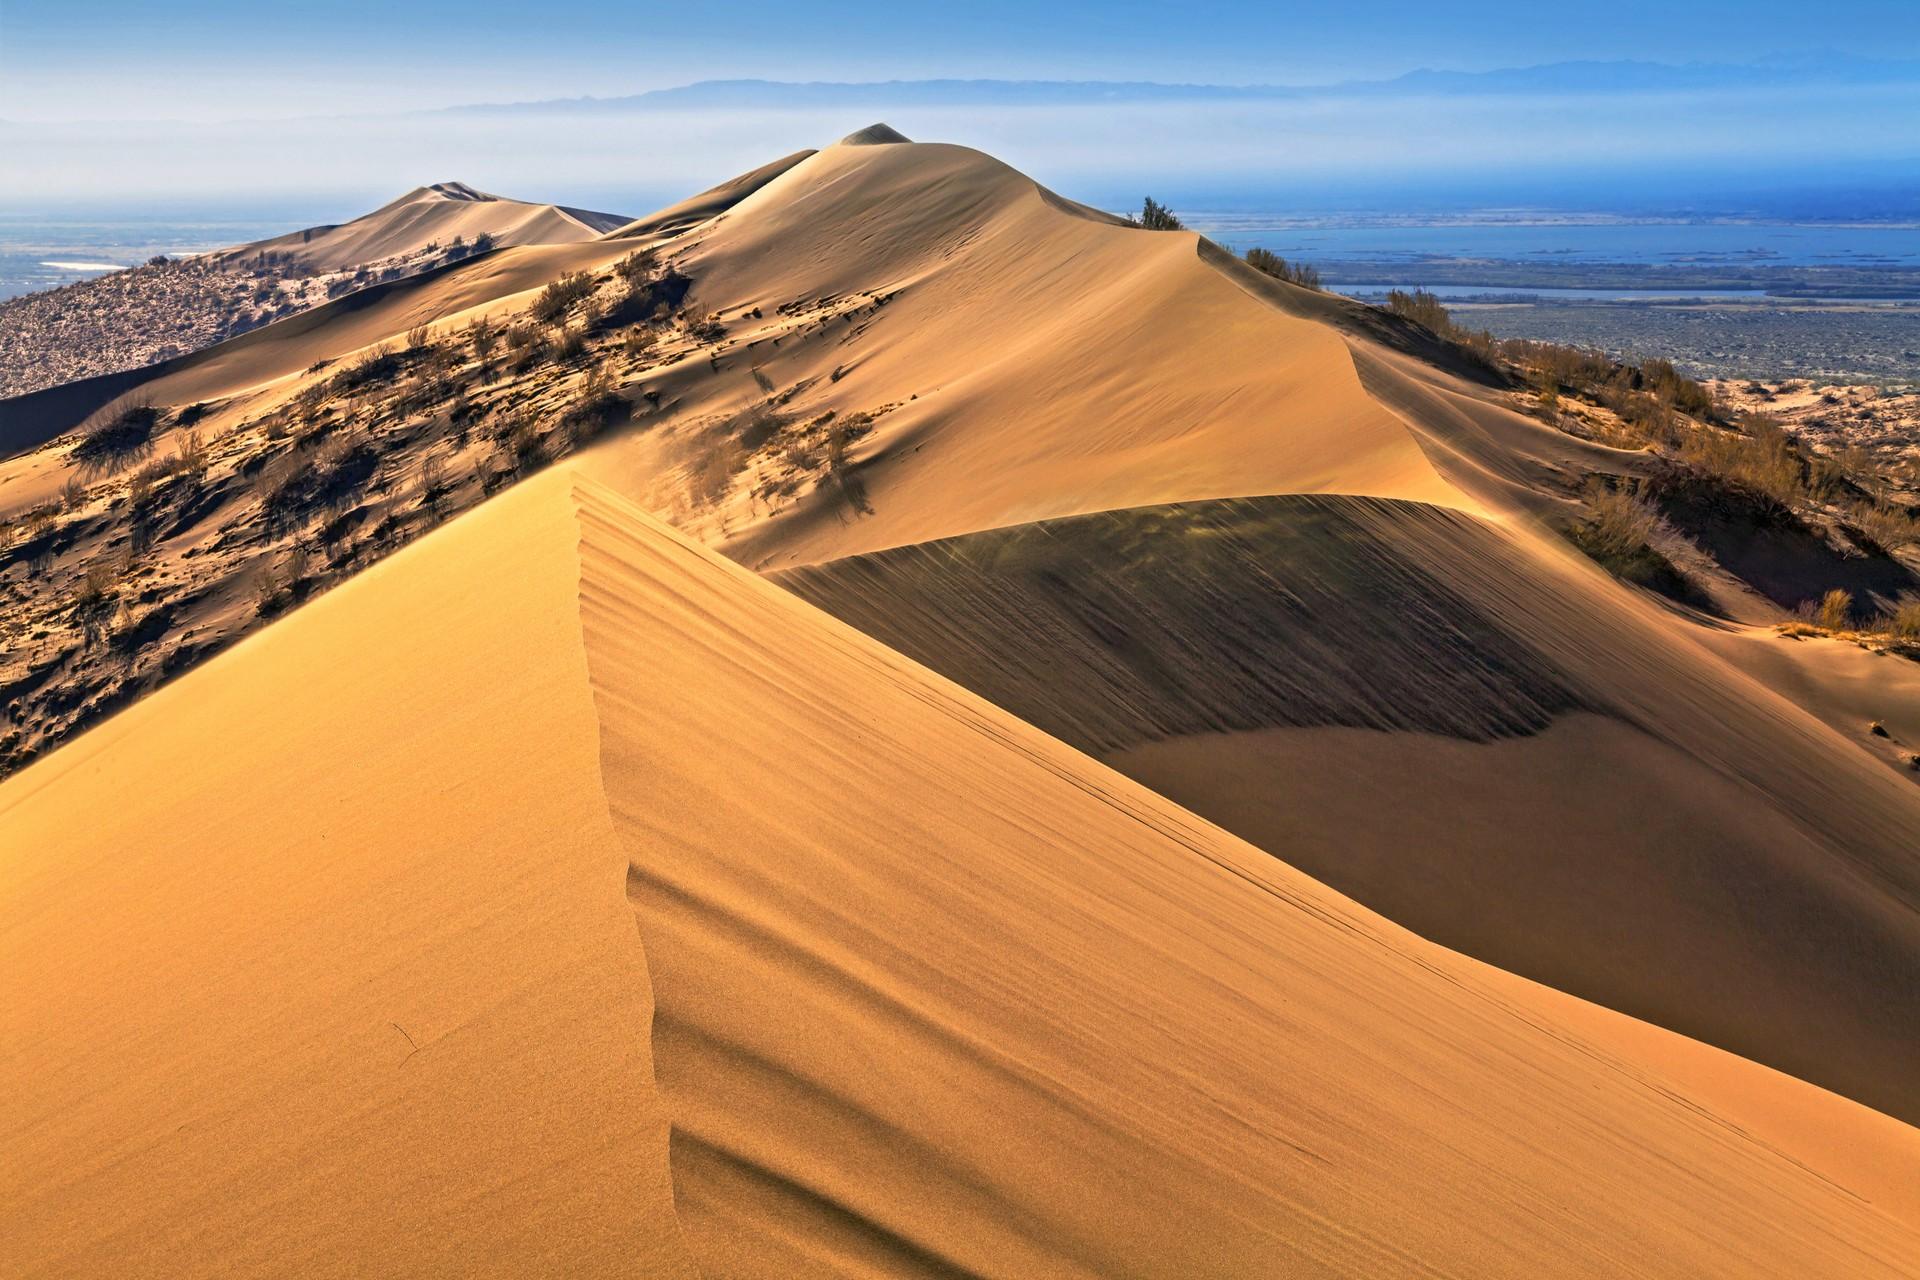 Singing sand dune in Kazakhstan